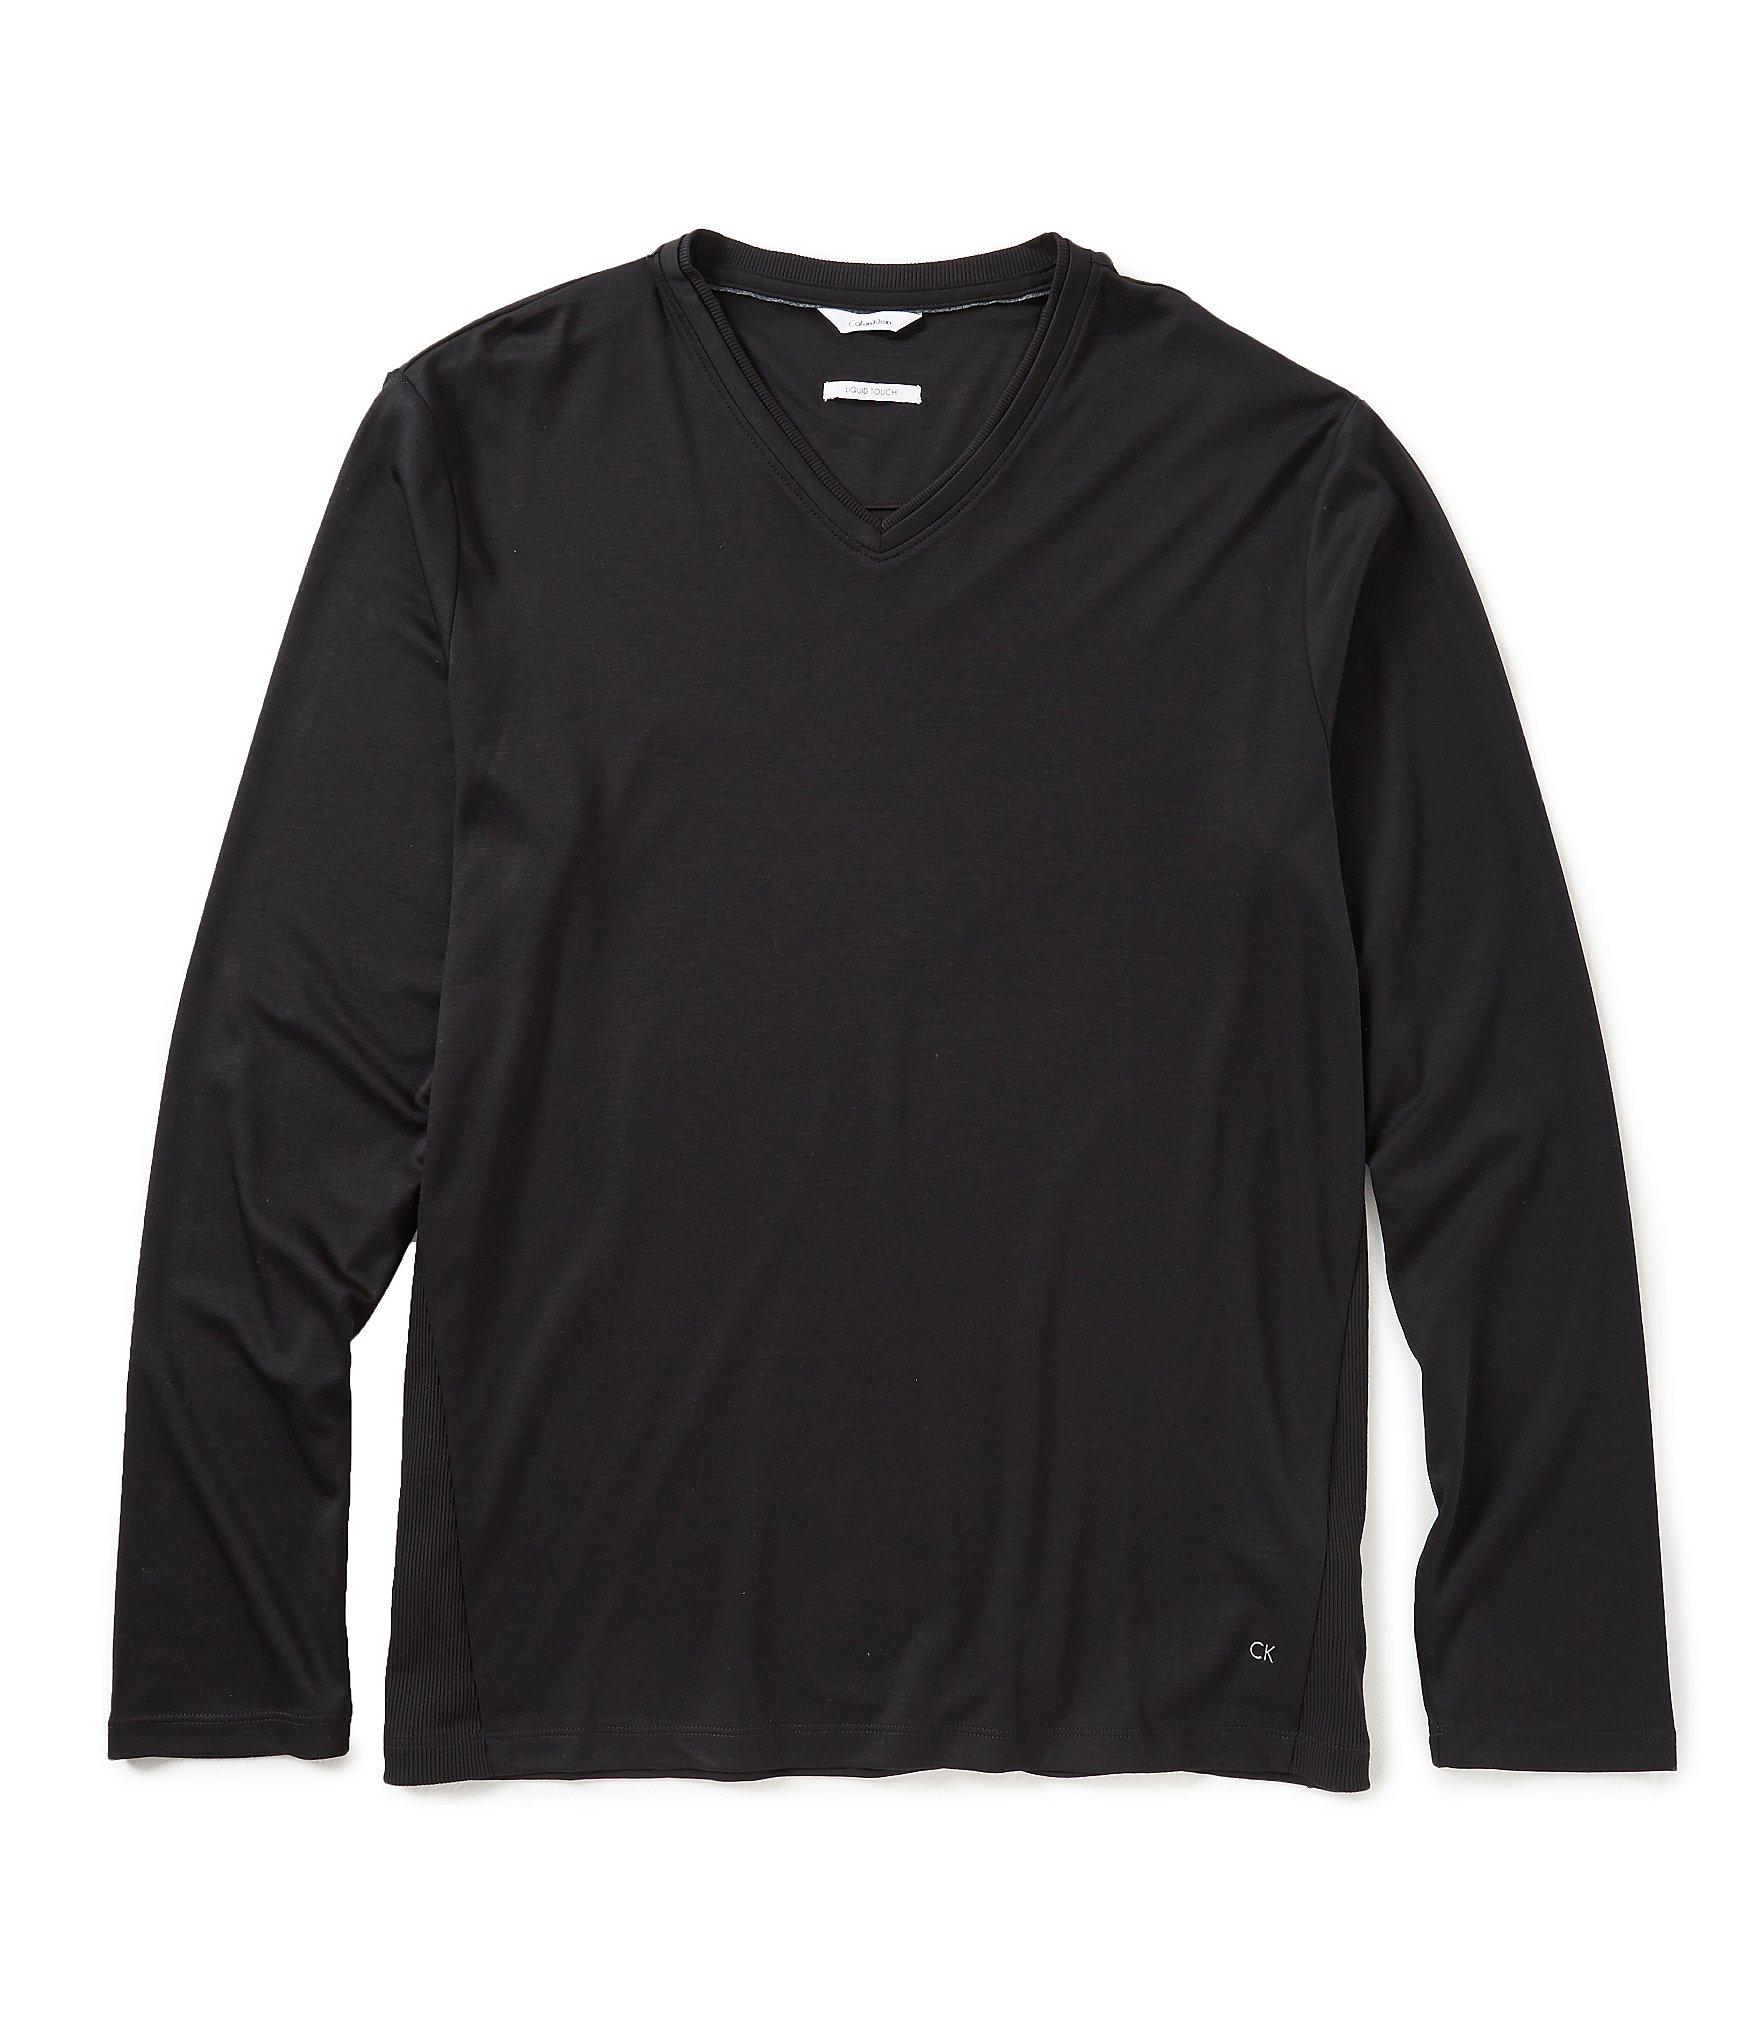 Black t shirt pic - Black T Shirt Pic 39